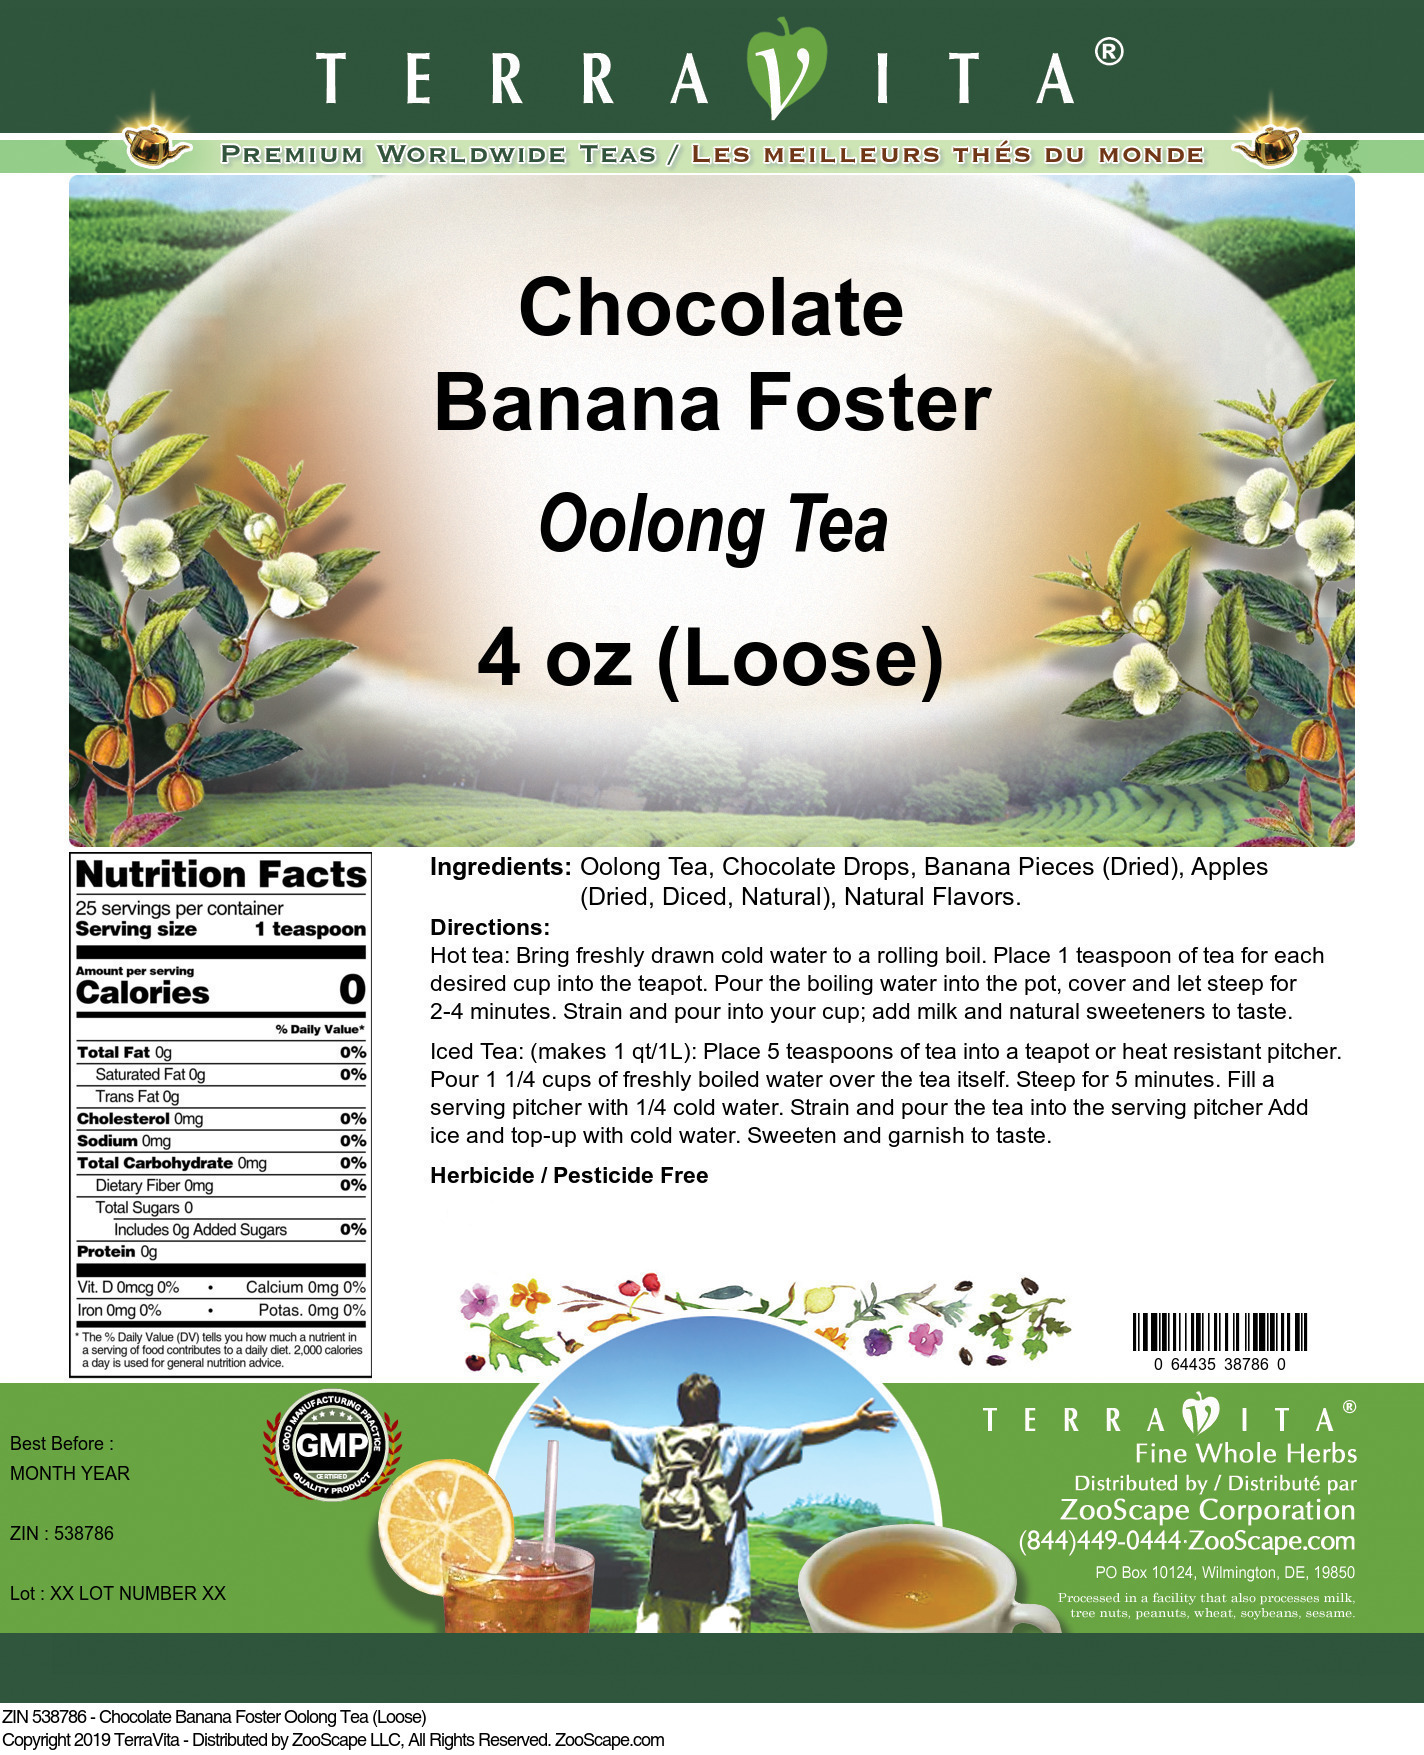 Chocolate Banana Foster Oolong Tea (Loose)